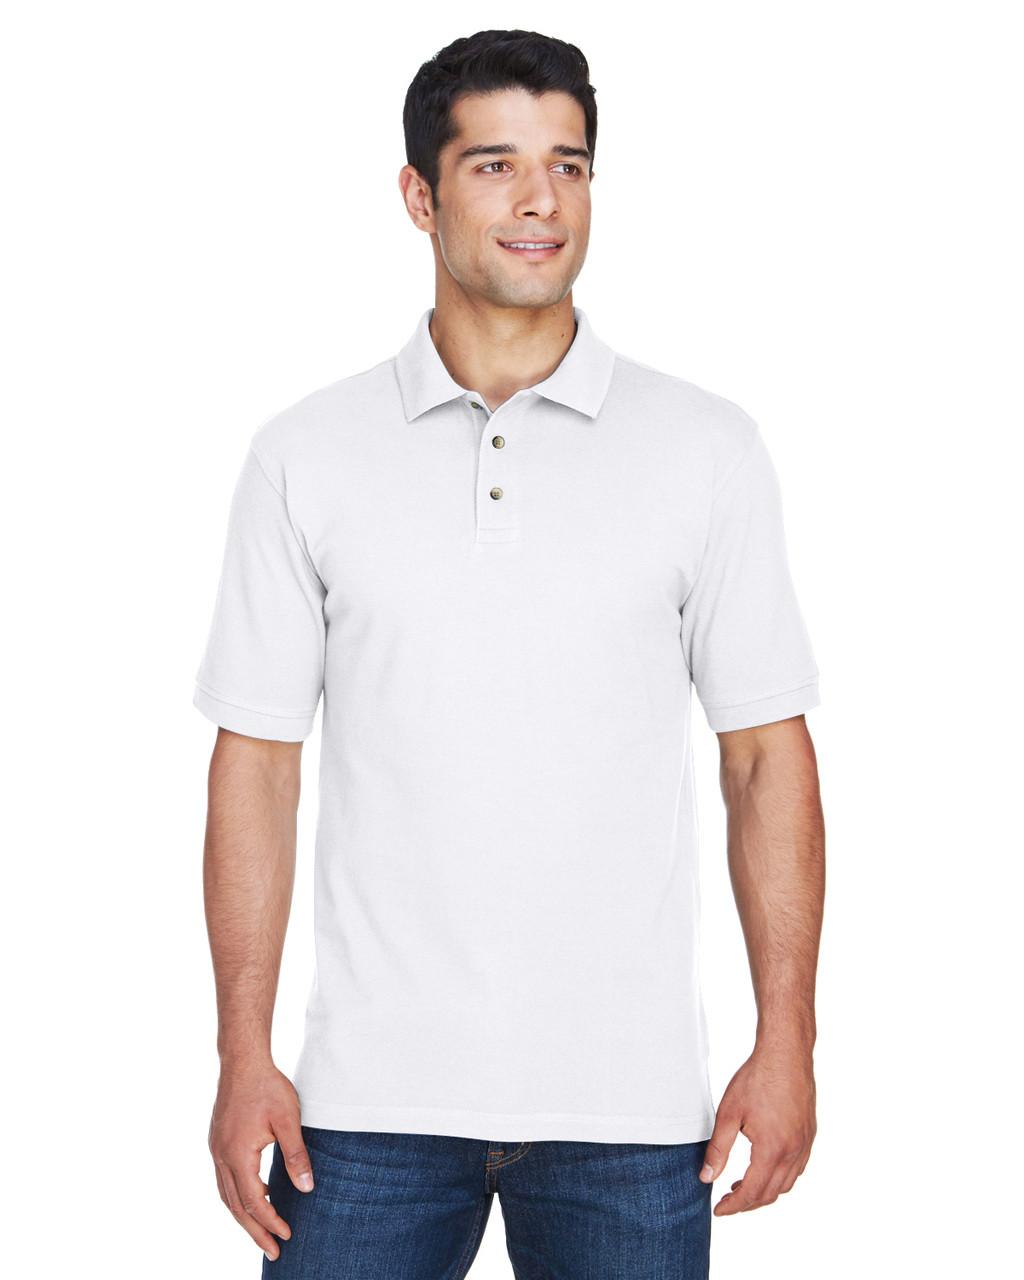 Ringspun Cotton Pique Short-Sleeve Polo L Harriton Boys 6 oz - Light College Blue M200Y